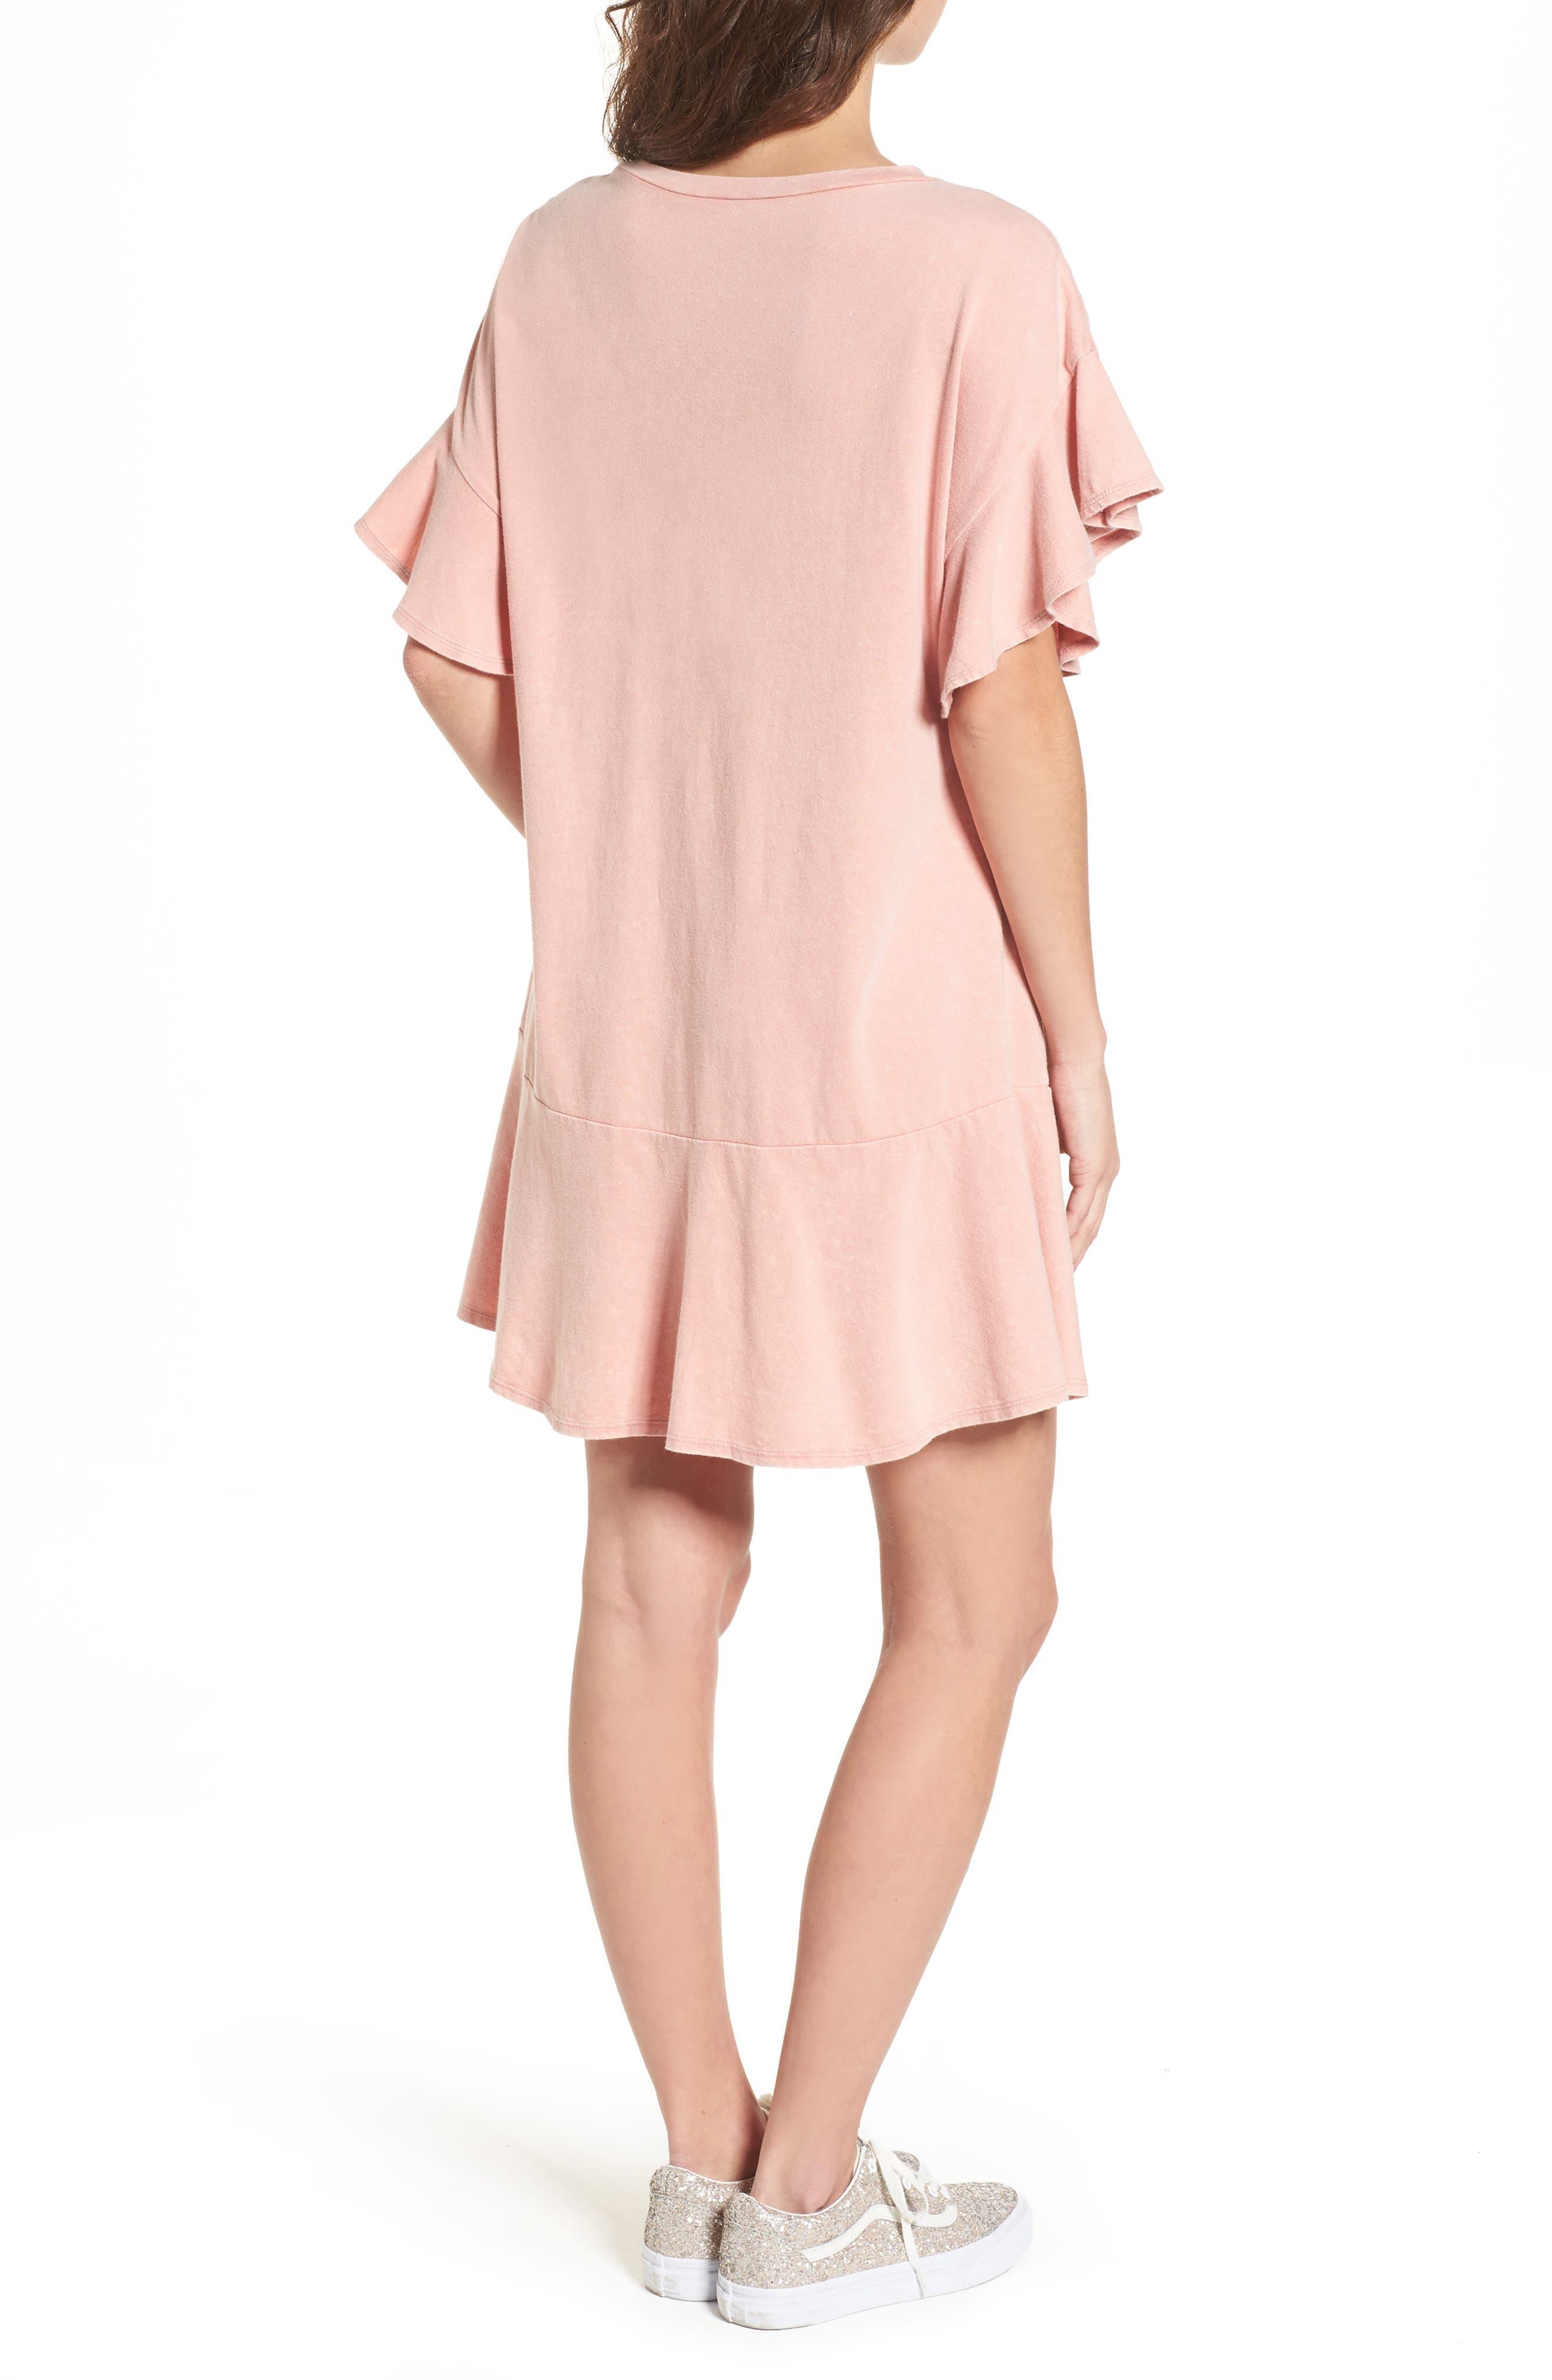 Stonewash Ruffle Trim Dress,                             Alternate thumbnail 2, color,                             Pink Dawn